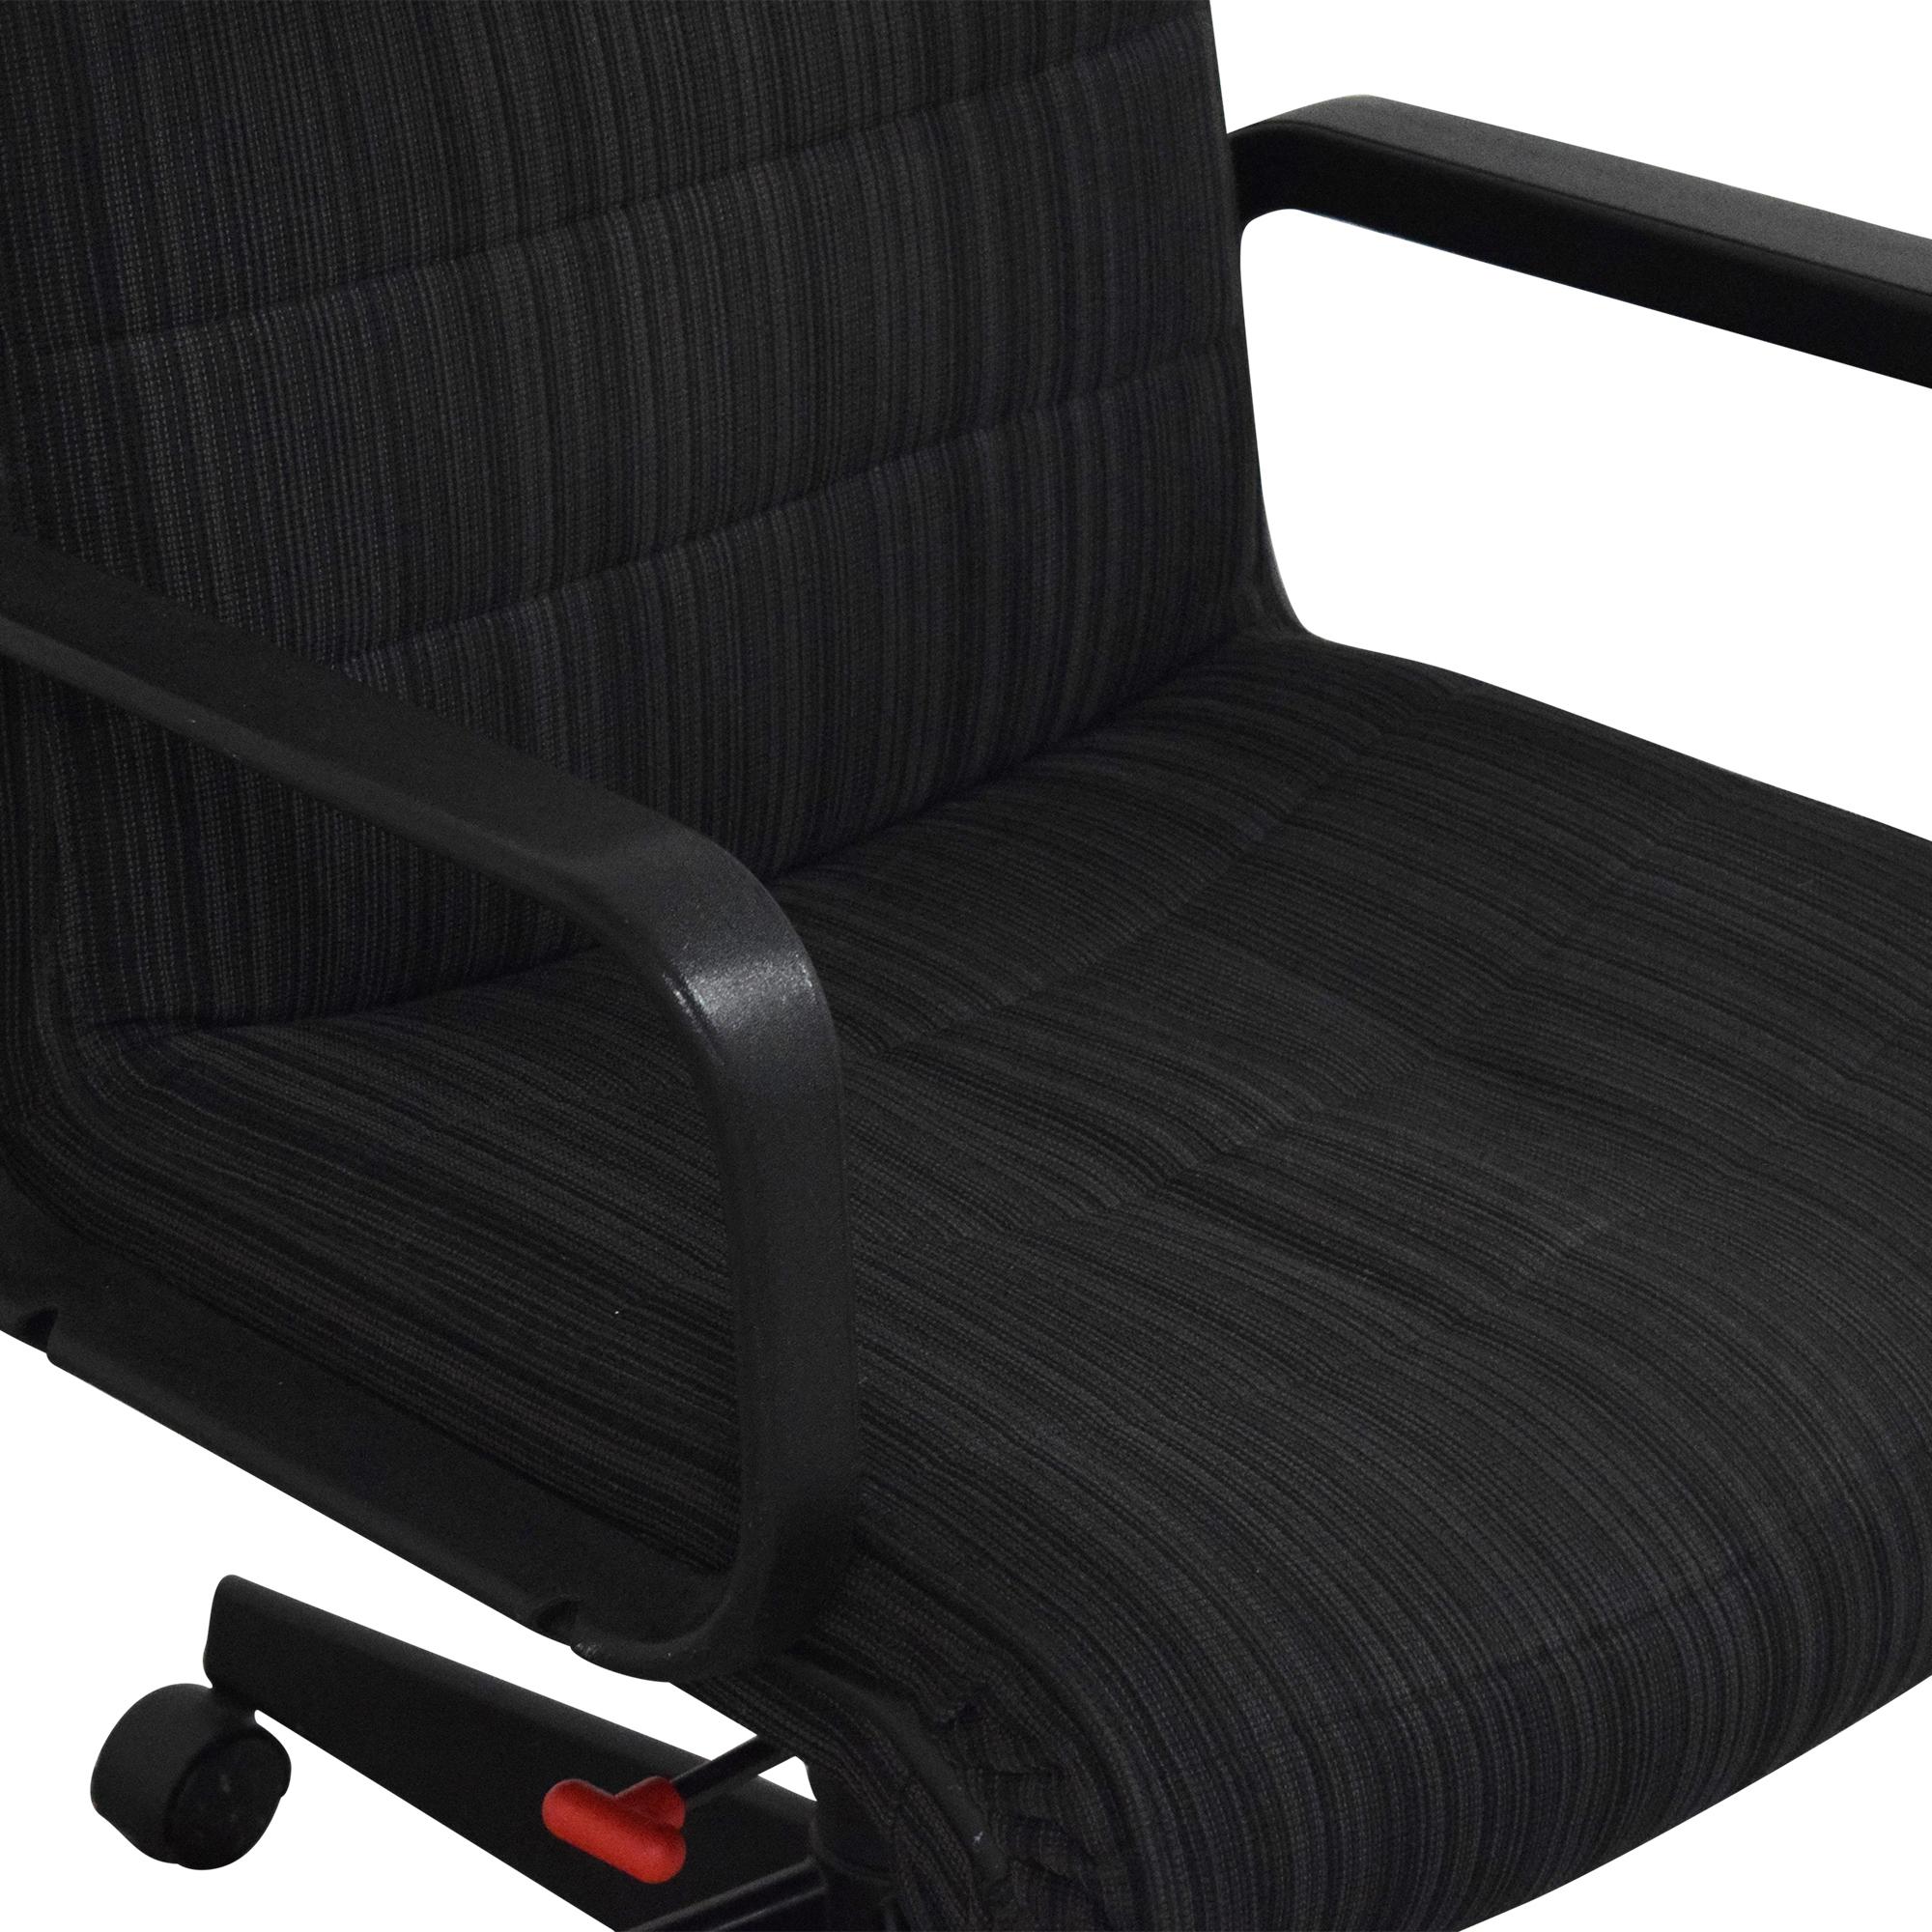 Knoll Knoll Richard Sapper Desk Chair